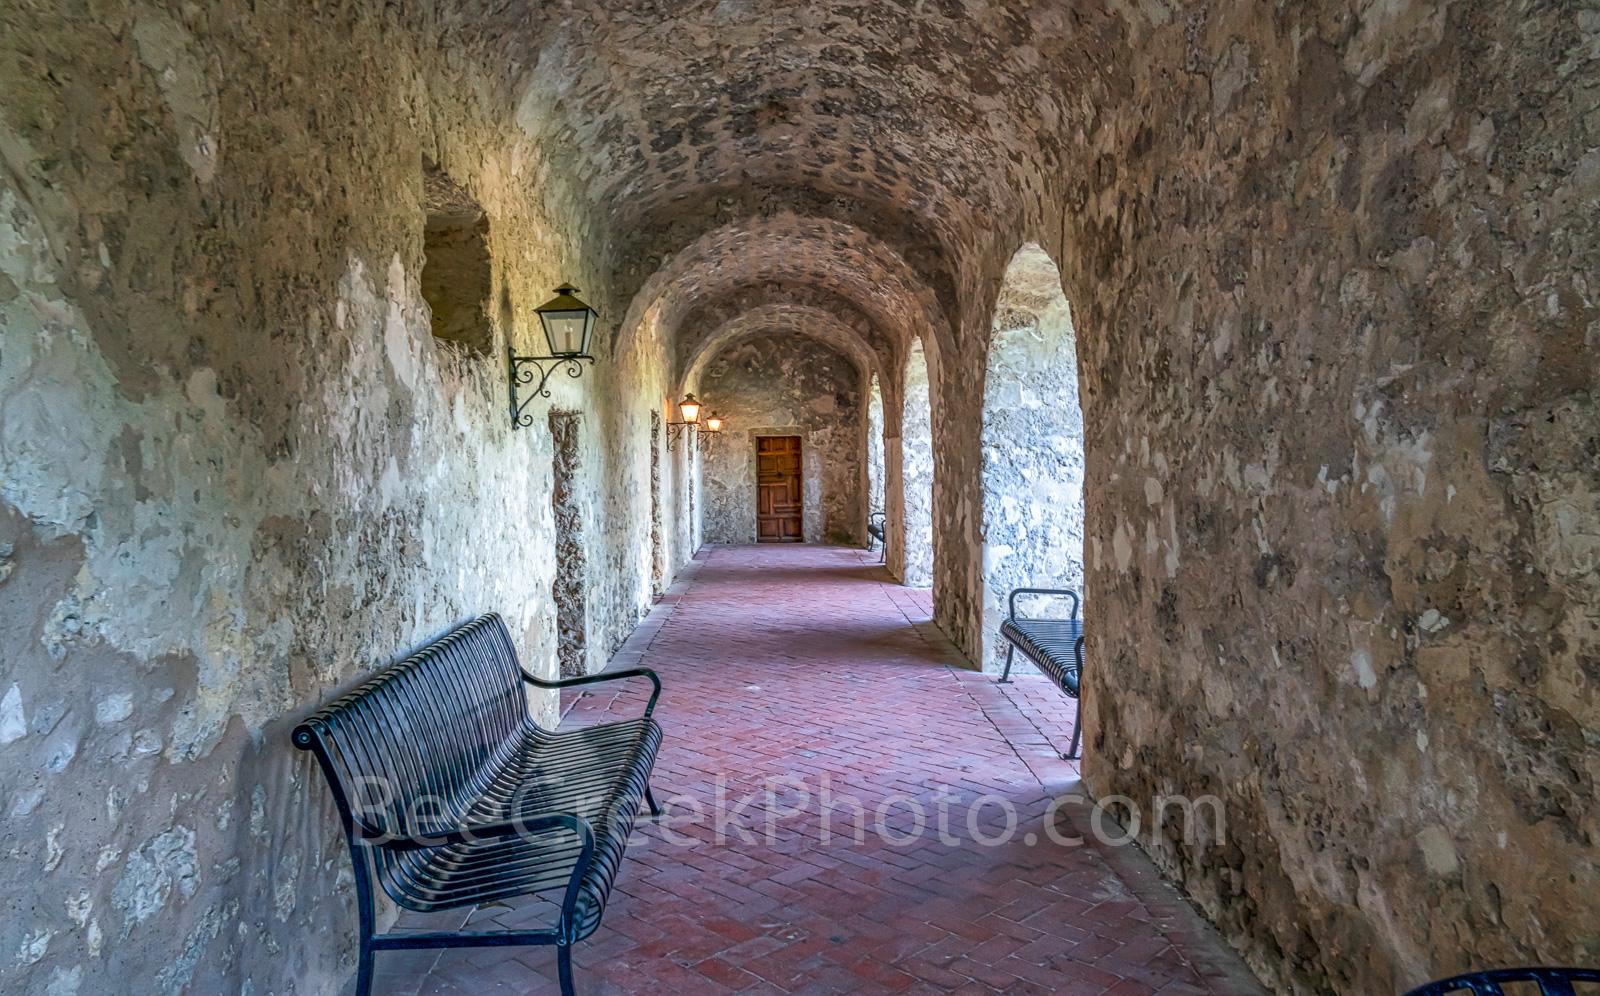 Mission Concepcion, San Antonio Missions National Historical Park, church, Catholic, , photo